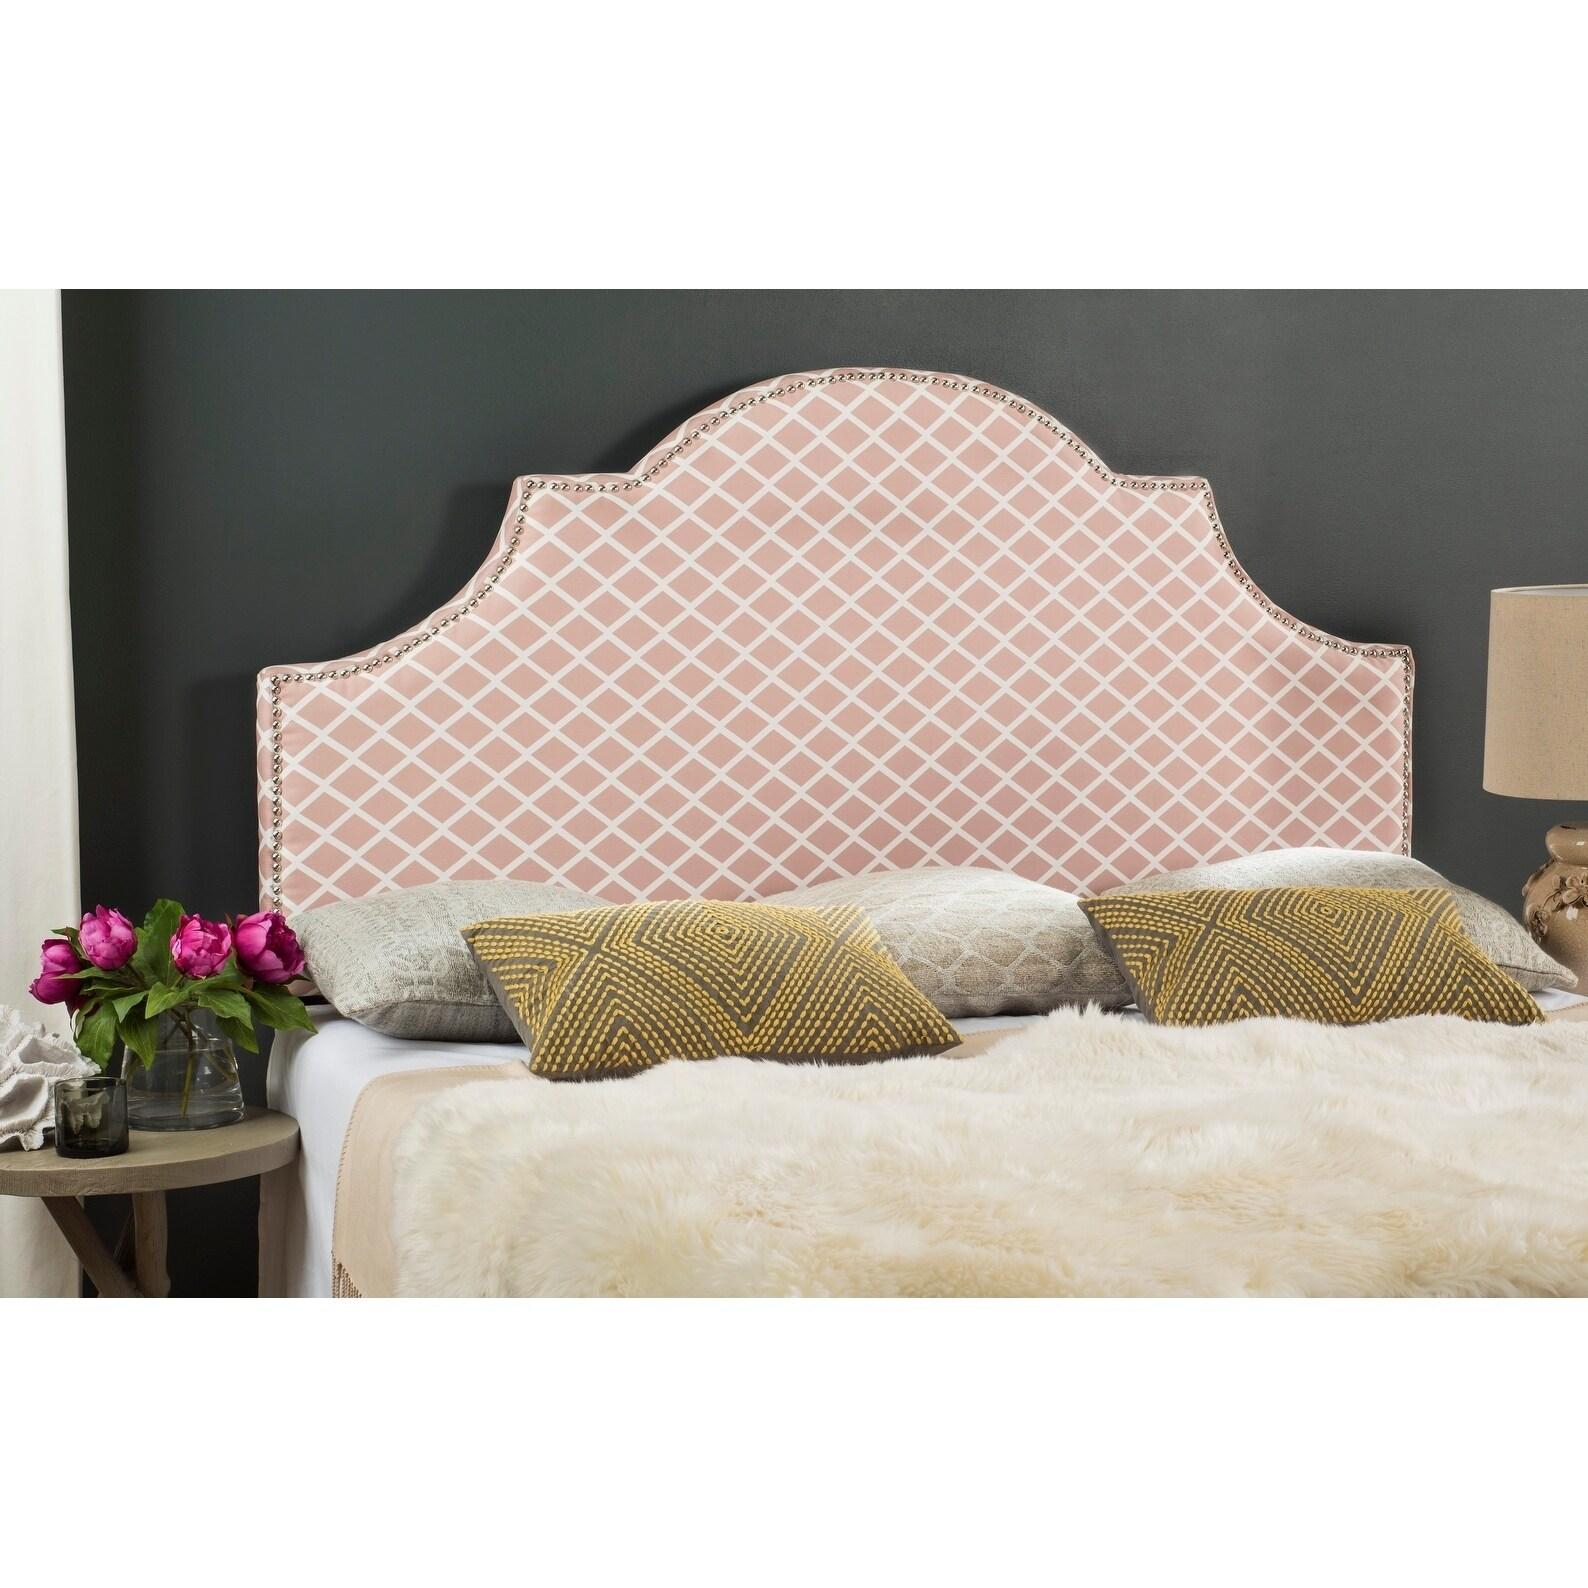 Safavieh Hallmar Peach Pink/ White Trellis Headboard - Si...